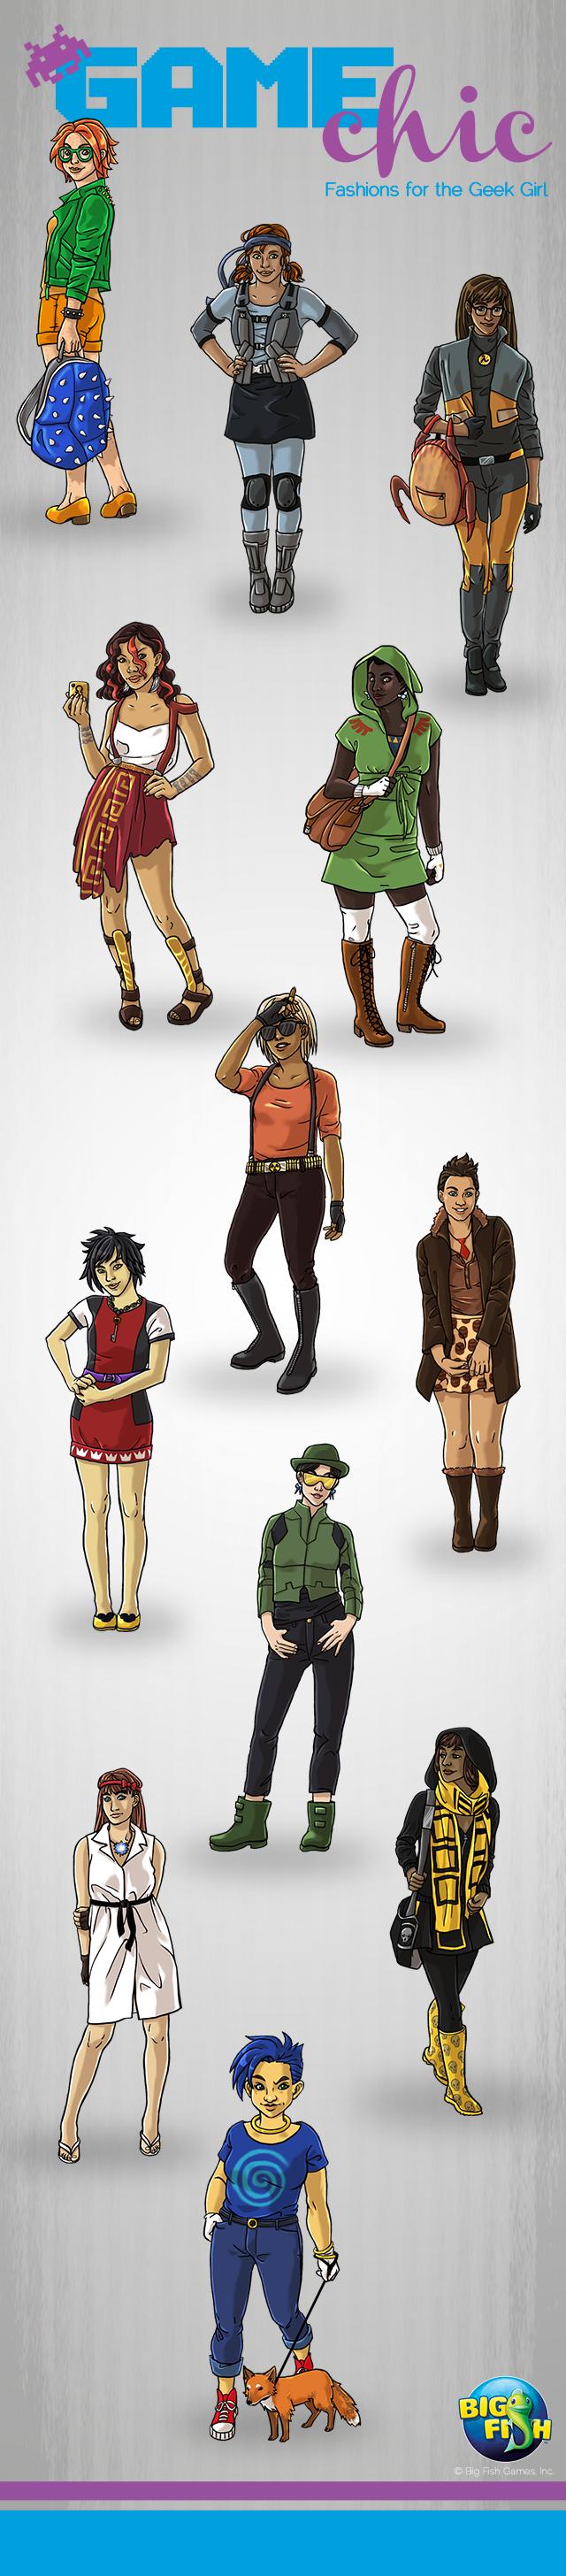 Big Fish Games' Video Game Character Designs | GeekGirlCon